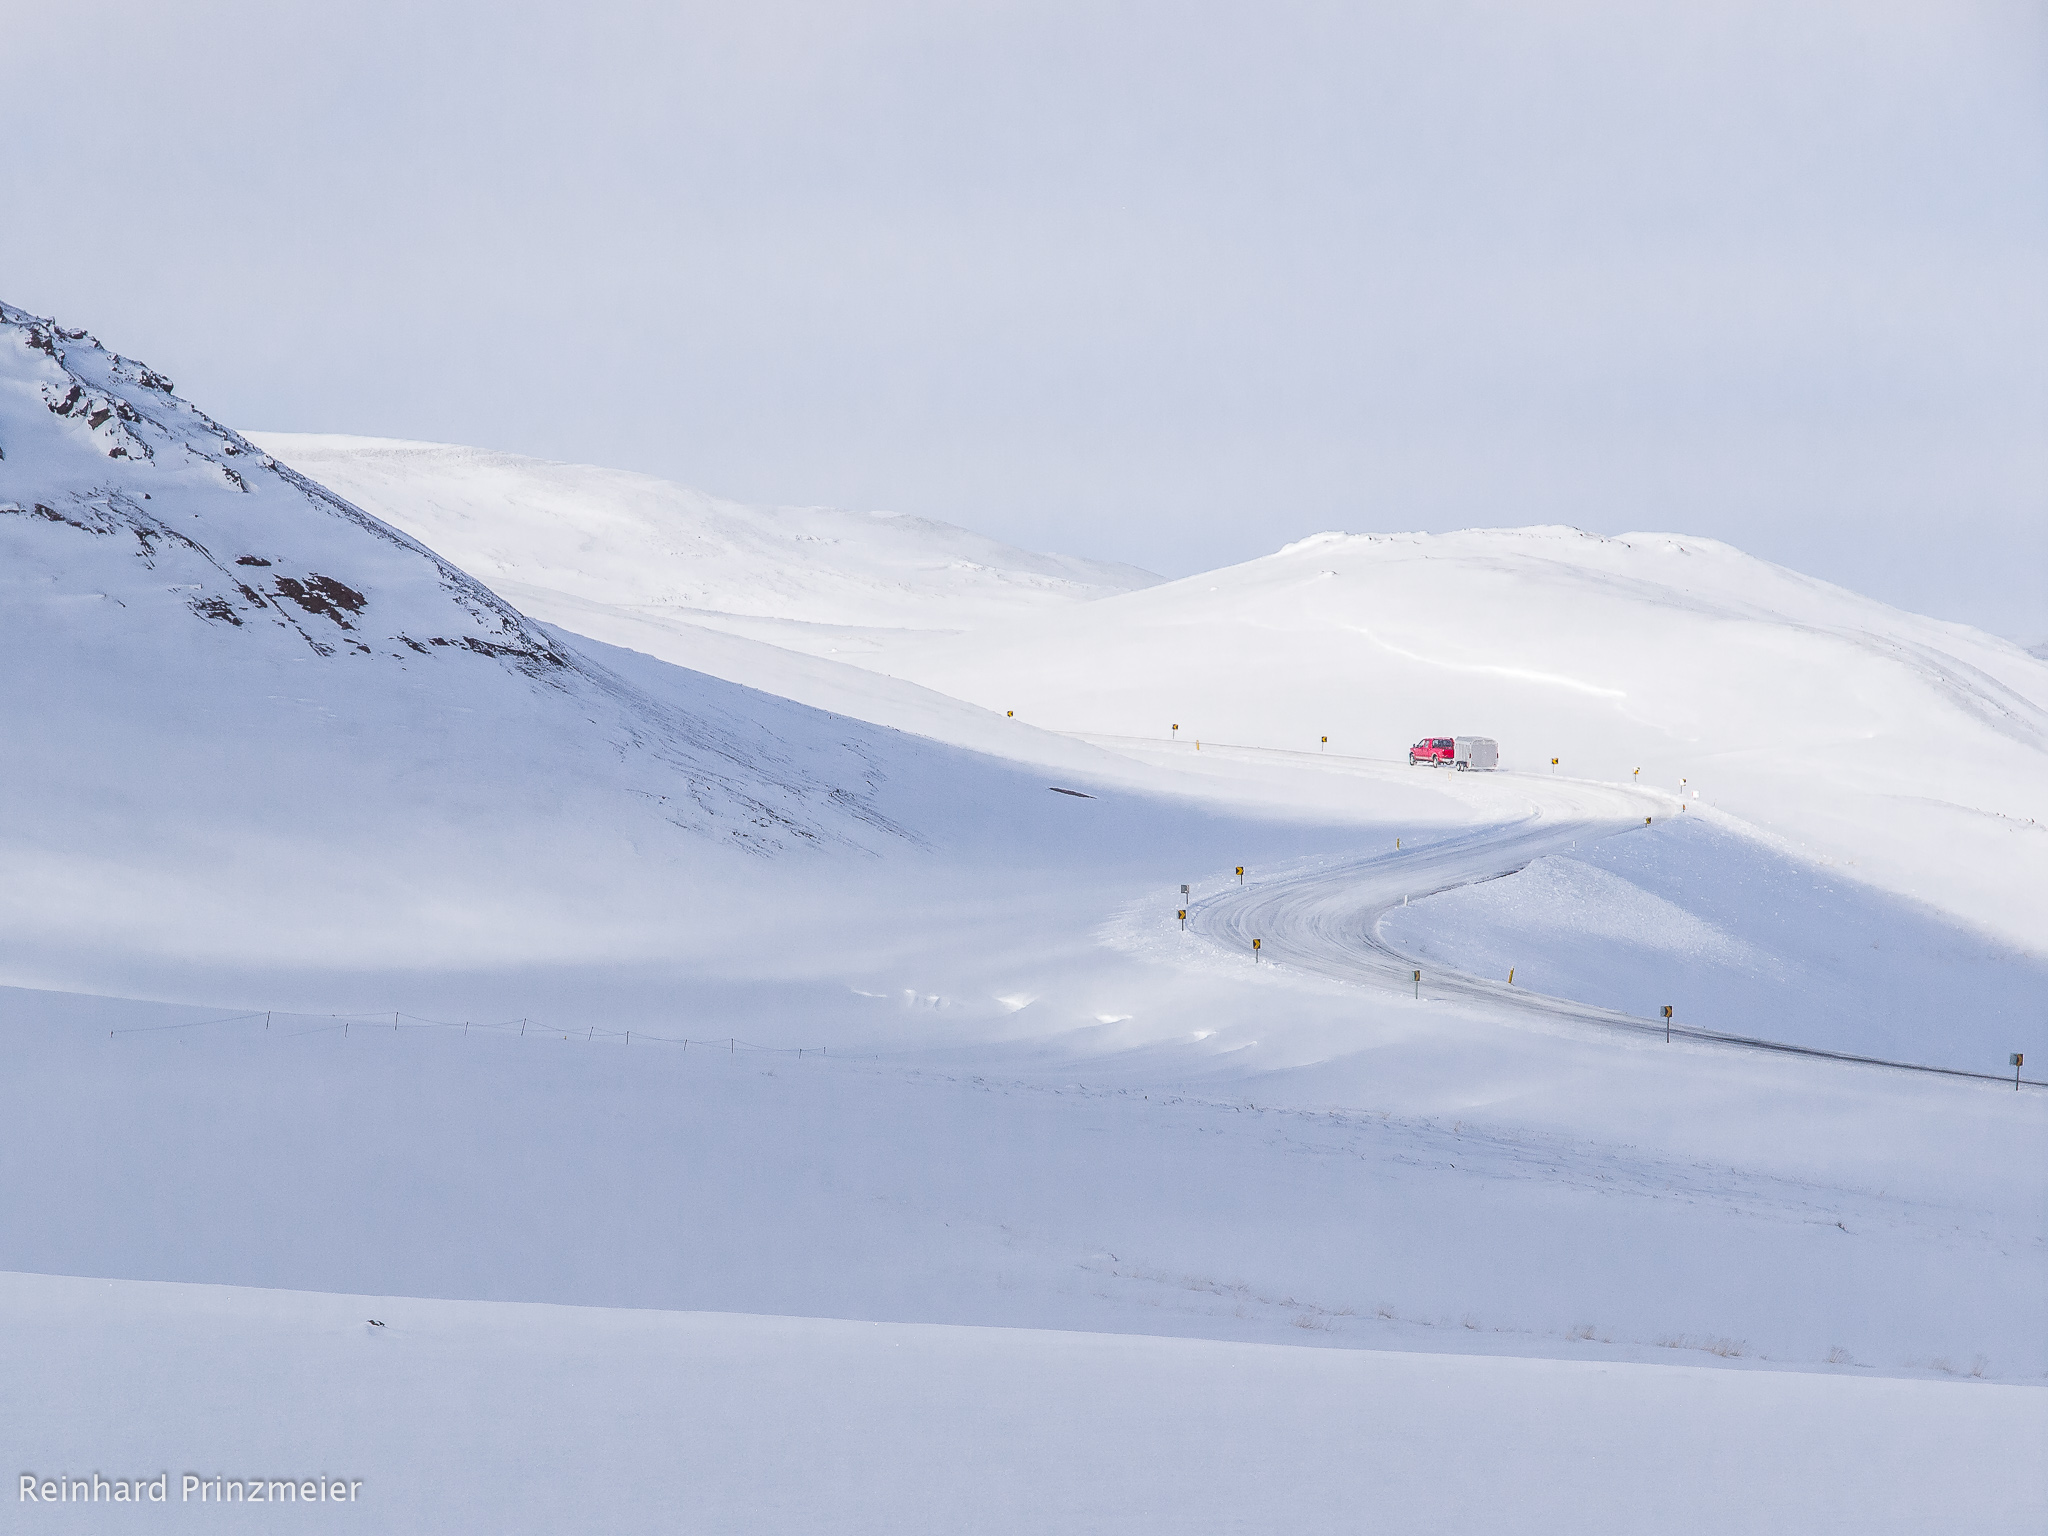 Namaskarð mountain pass, Iceland